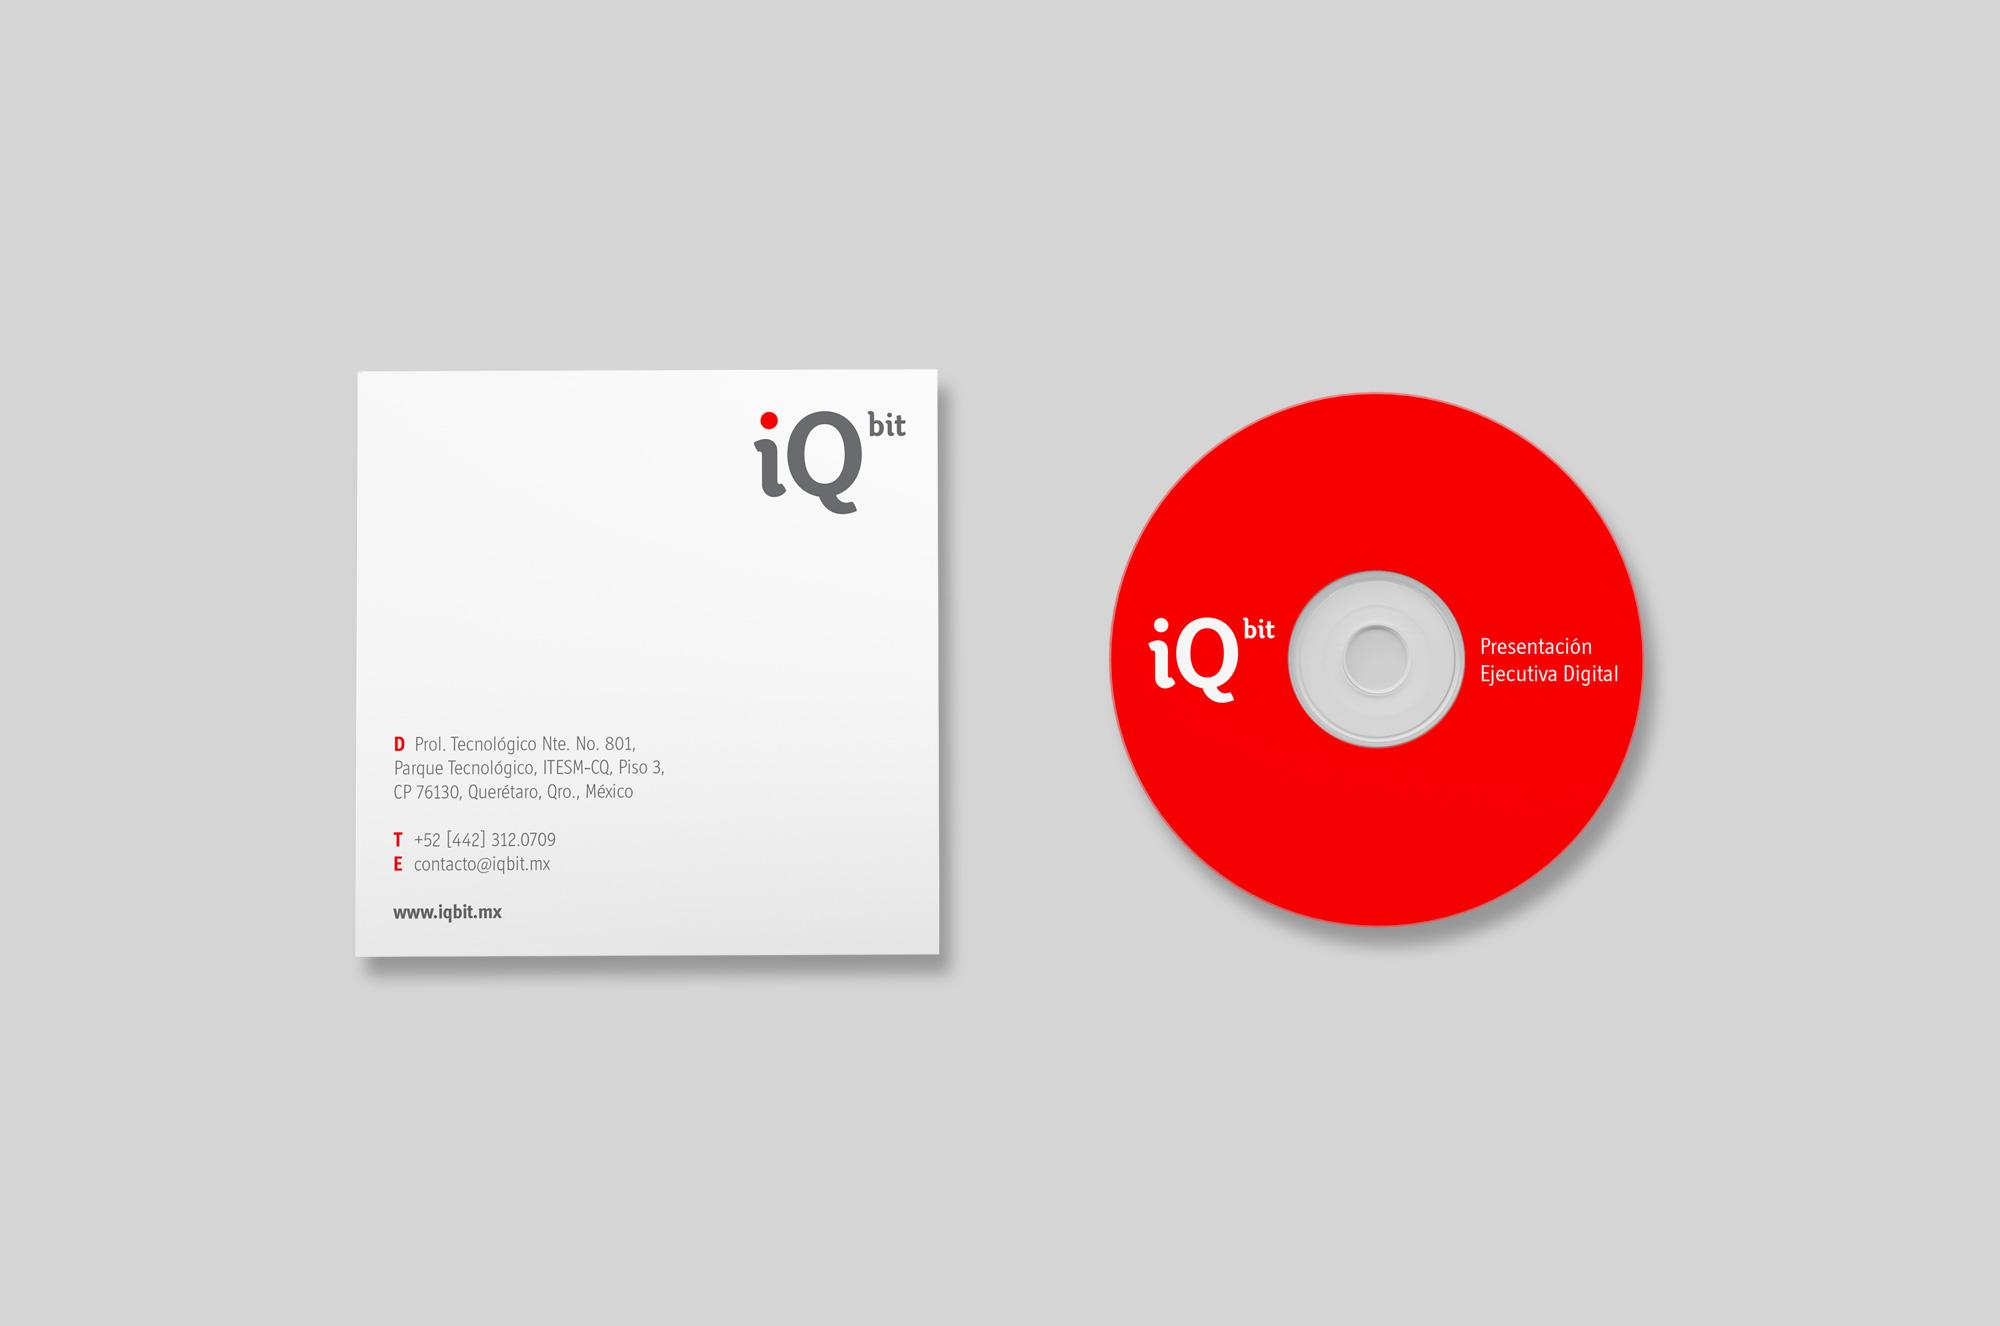 raniev-rod-alvarez-diseño-gráfico-queretaro-iqbit-2-cd